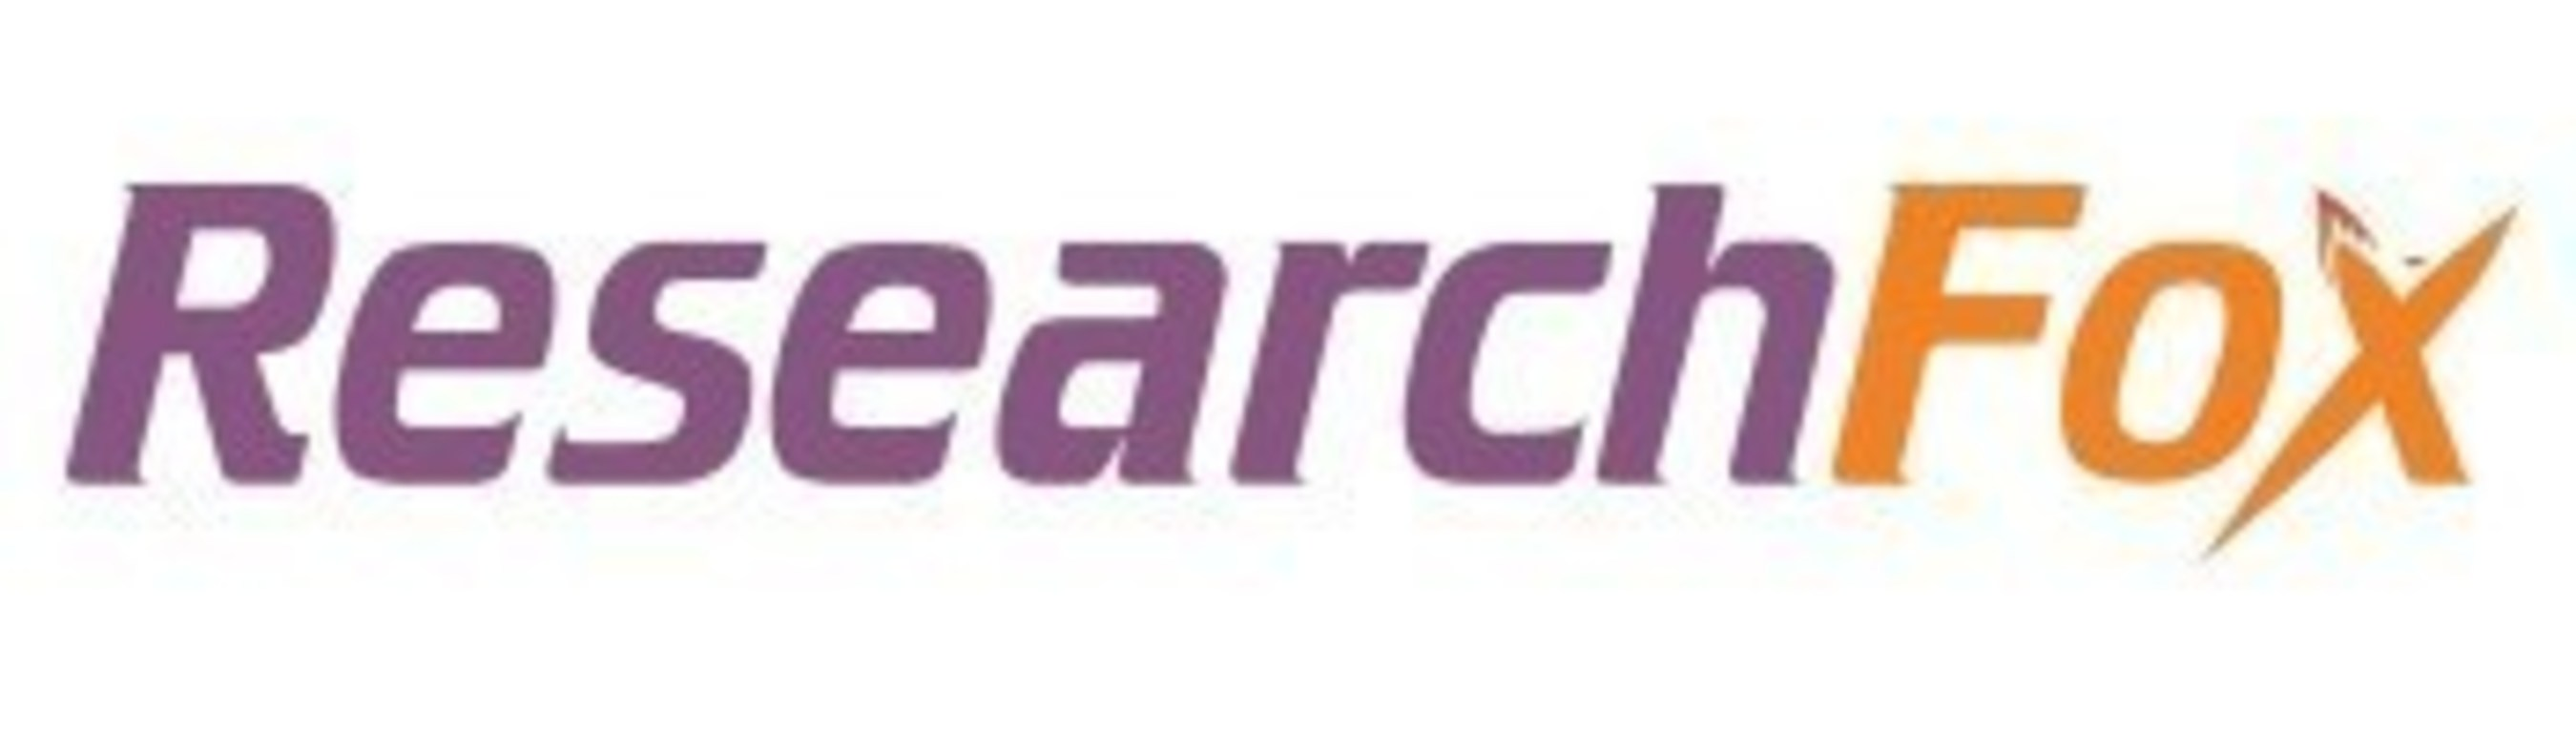 ResearchFox Consulting Pvt. Ltd. (PRNewsFoto/ResearchFox Consulting Pvt. Ltd.)